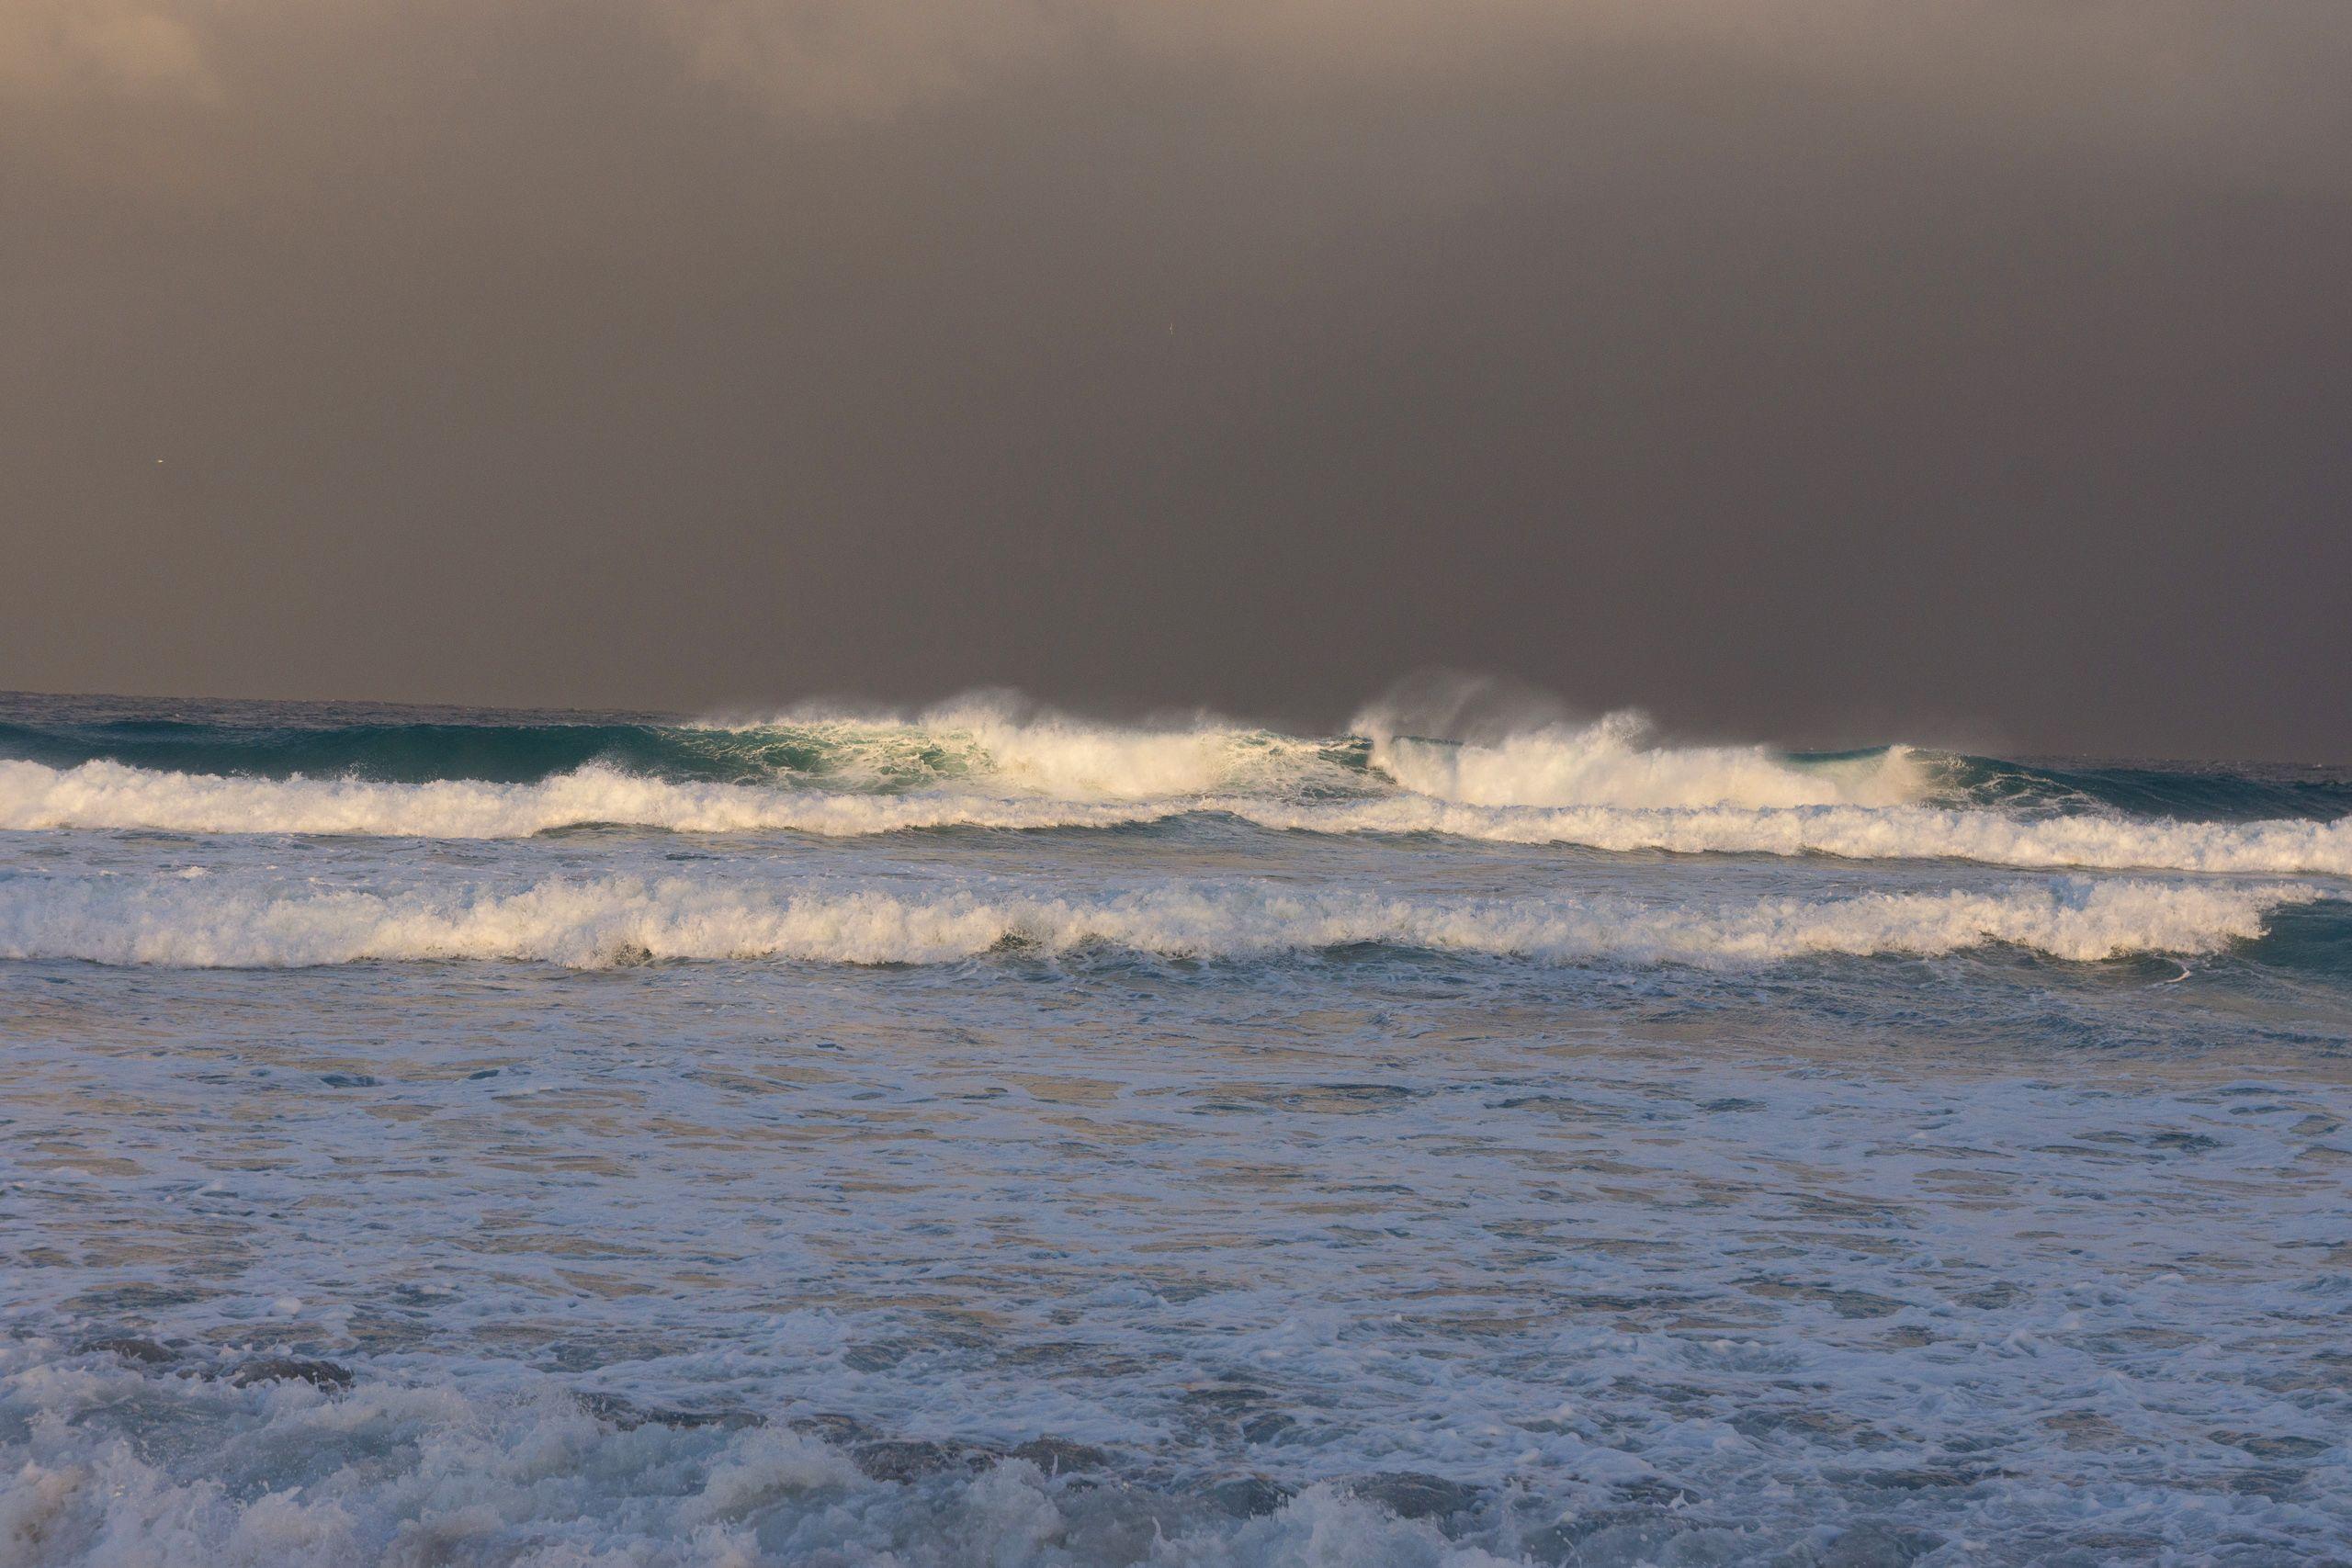 SEA SWELL 6